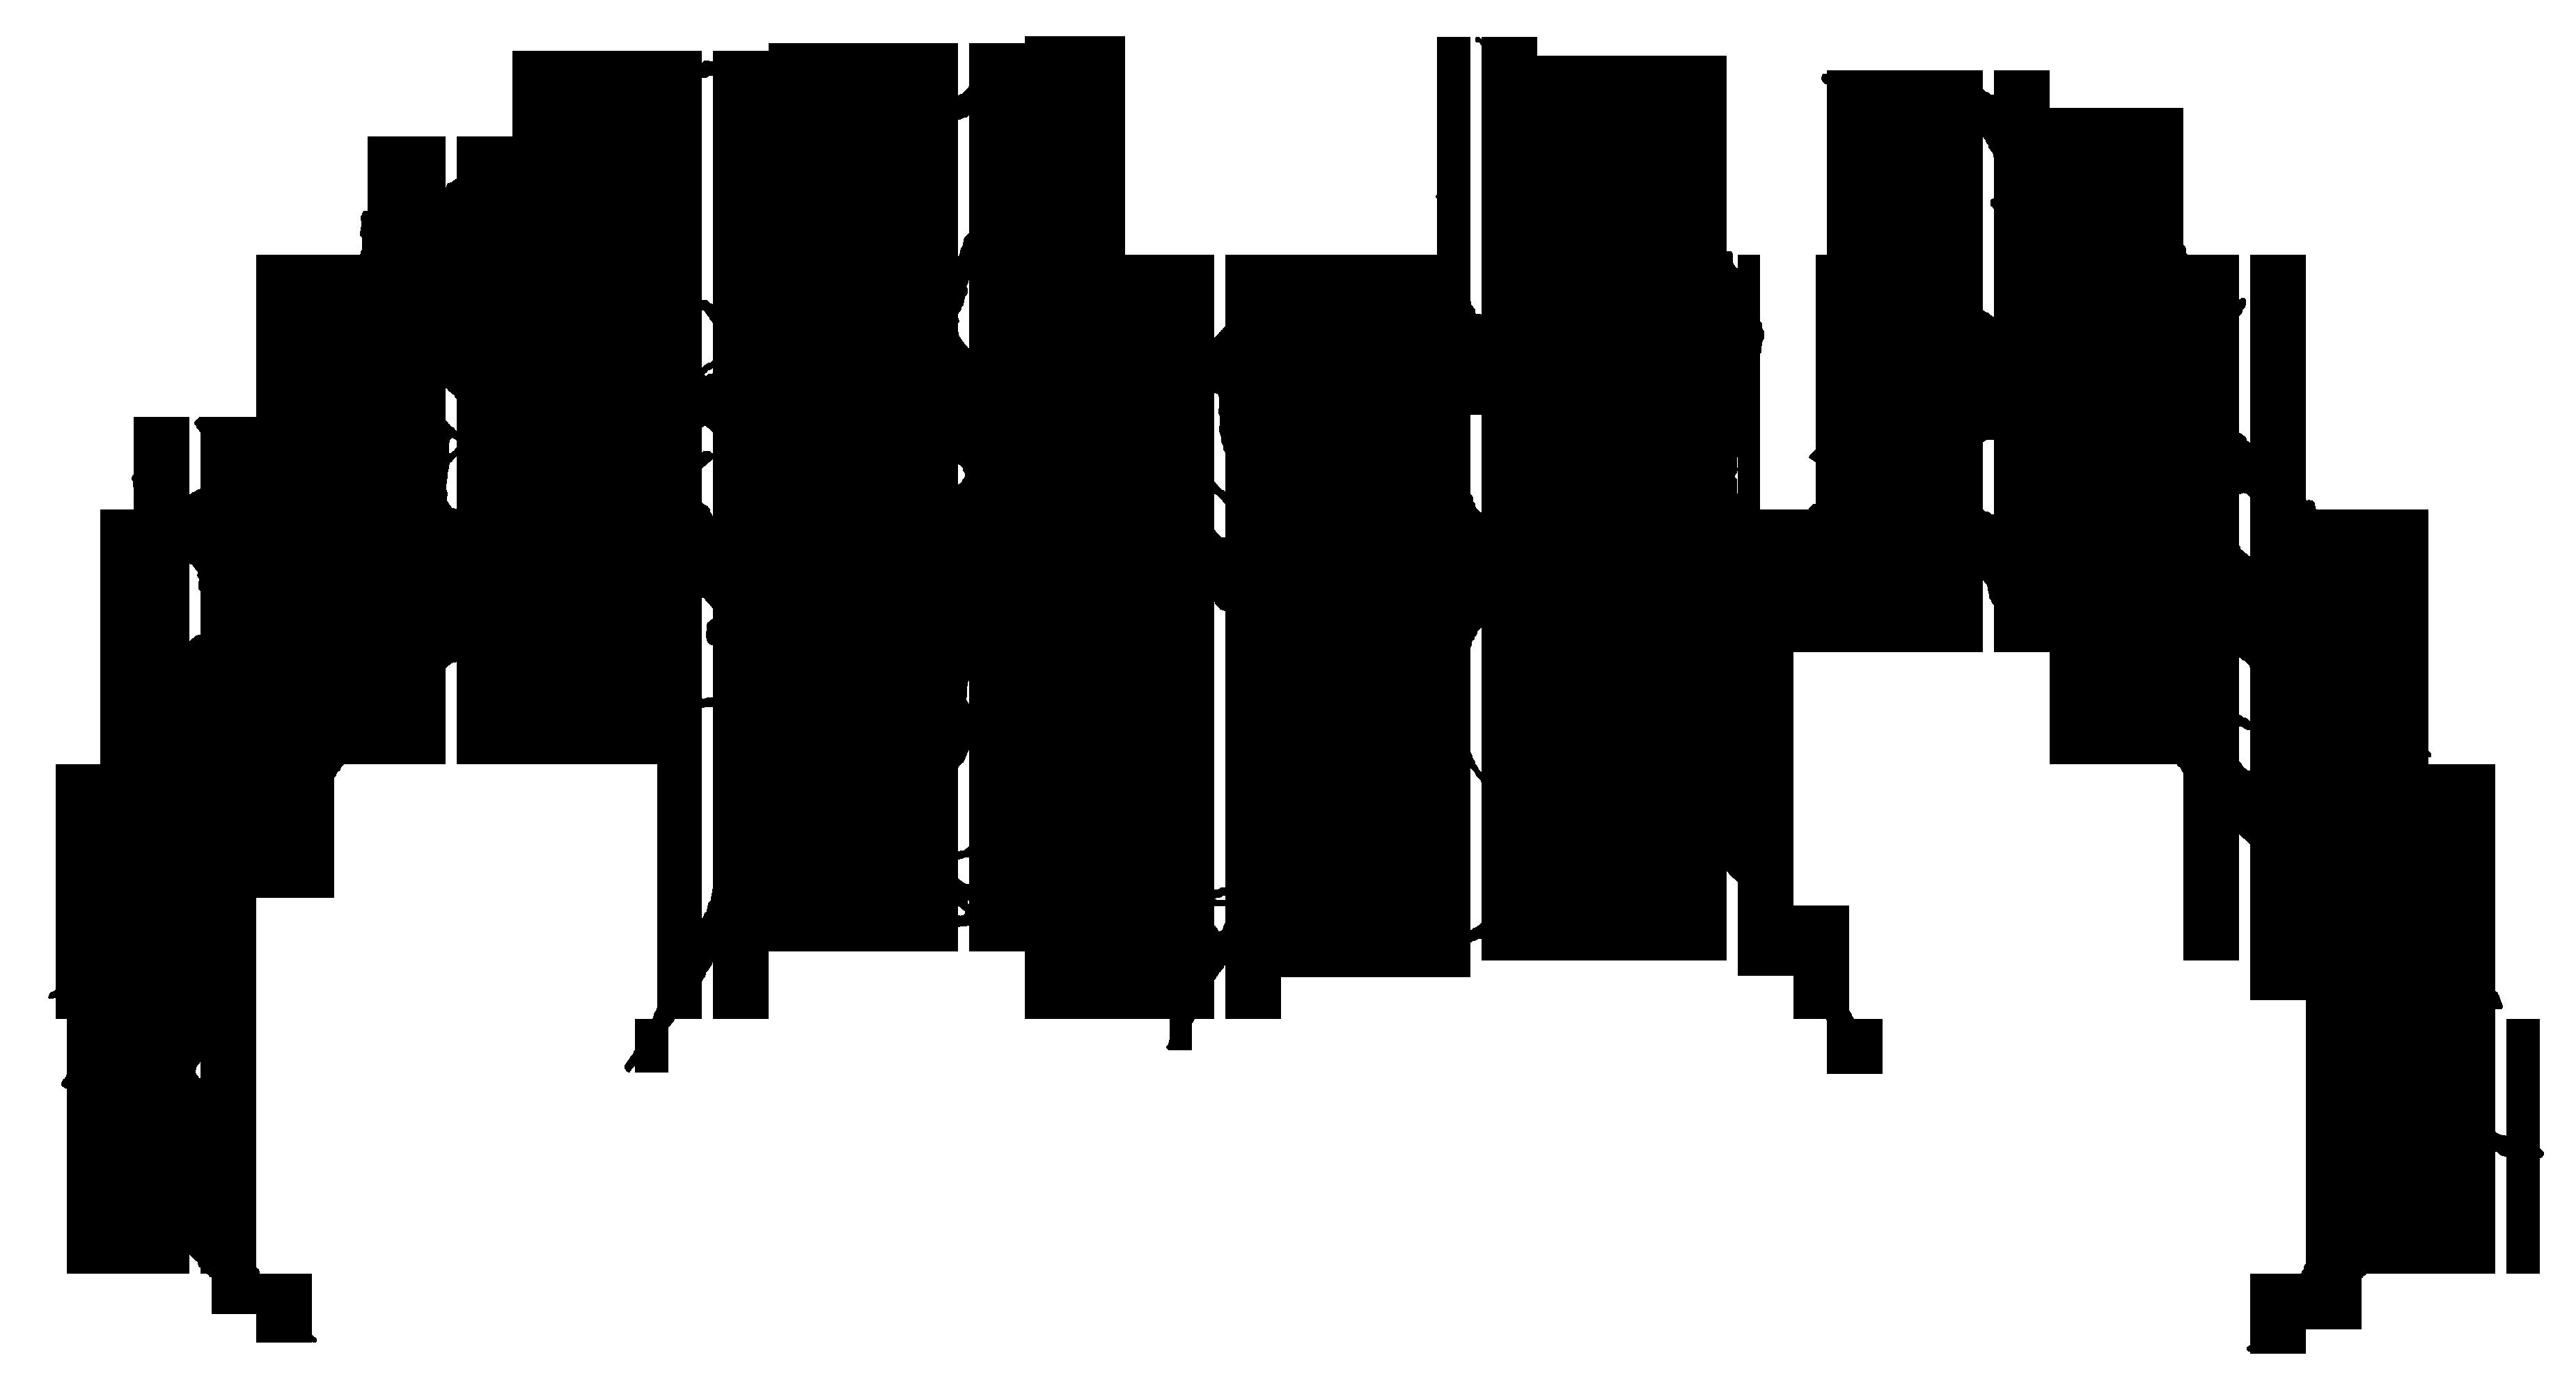 acrania logo by parkwayperry on deviantart